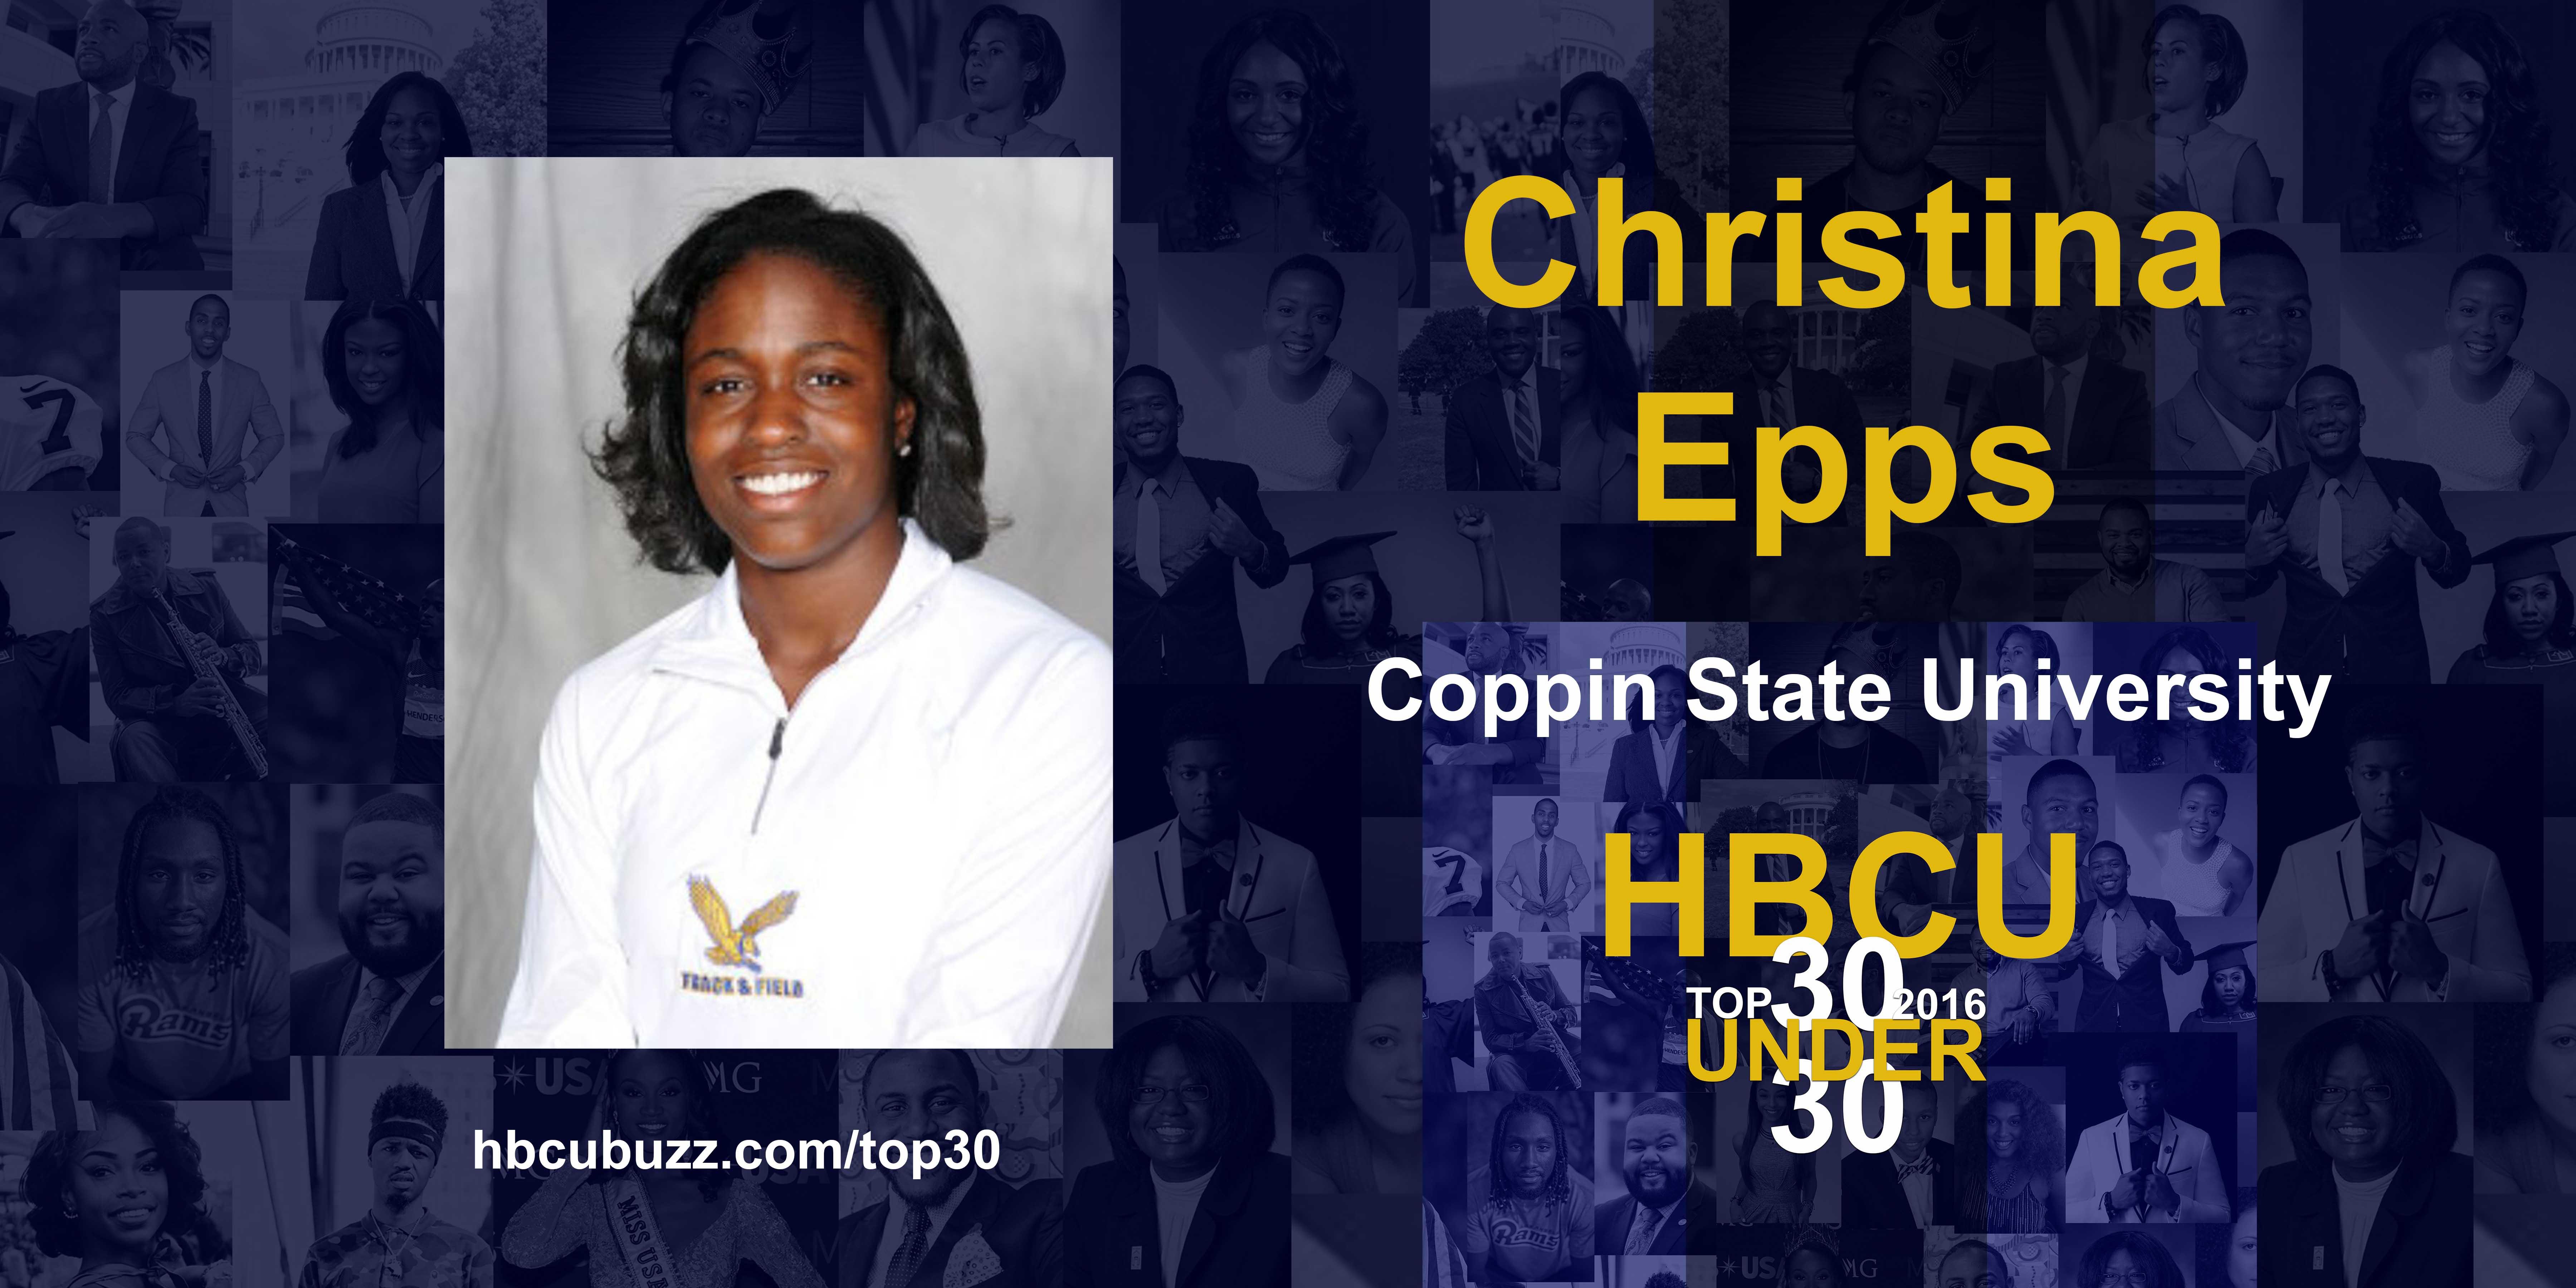 Christina Epps